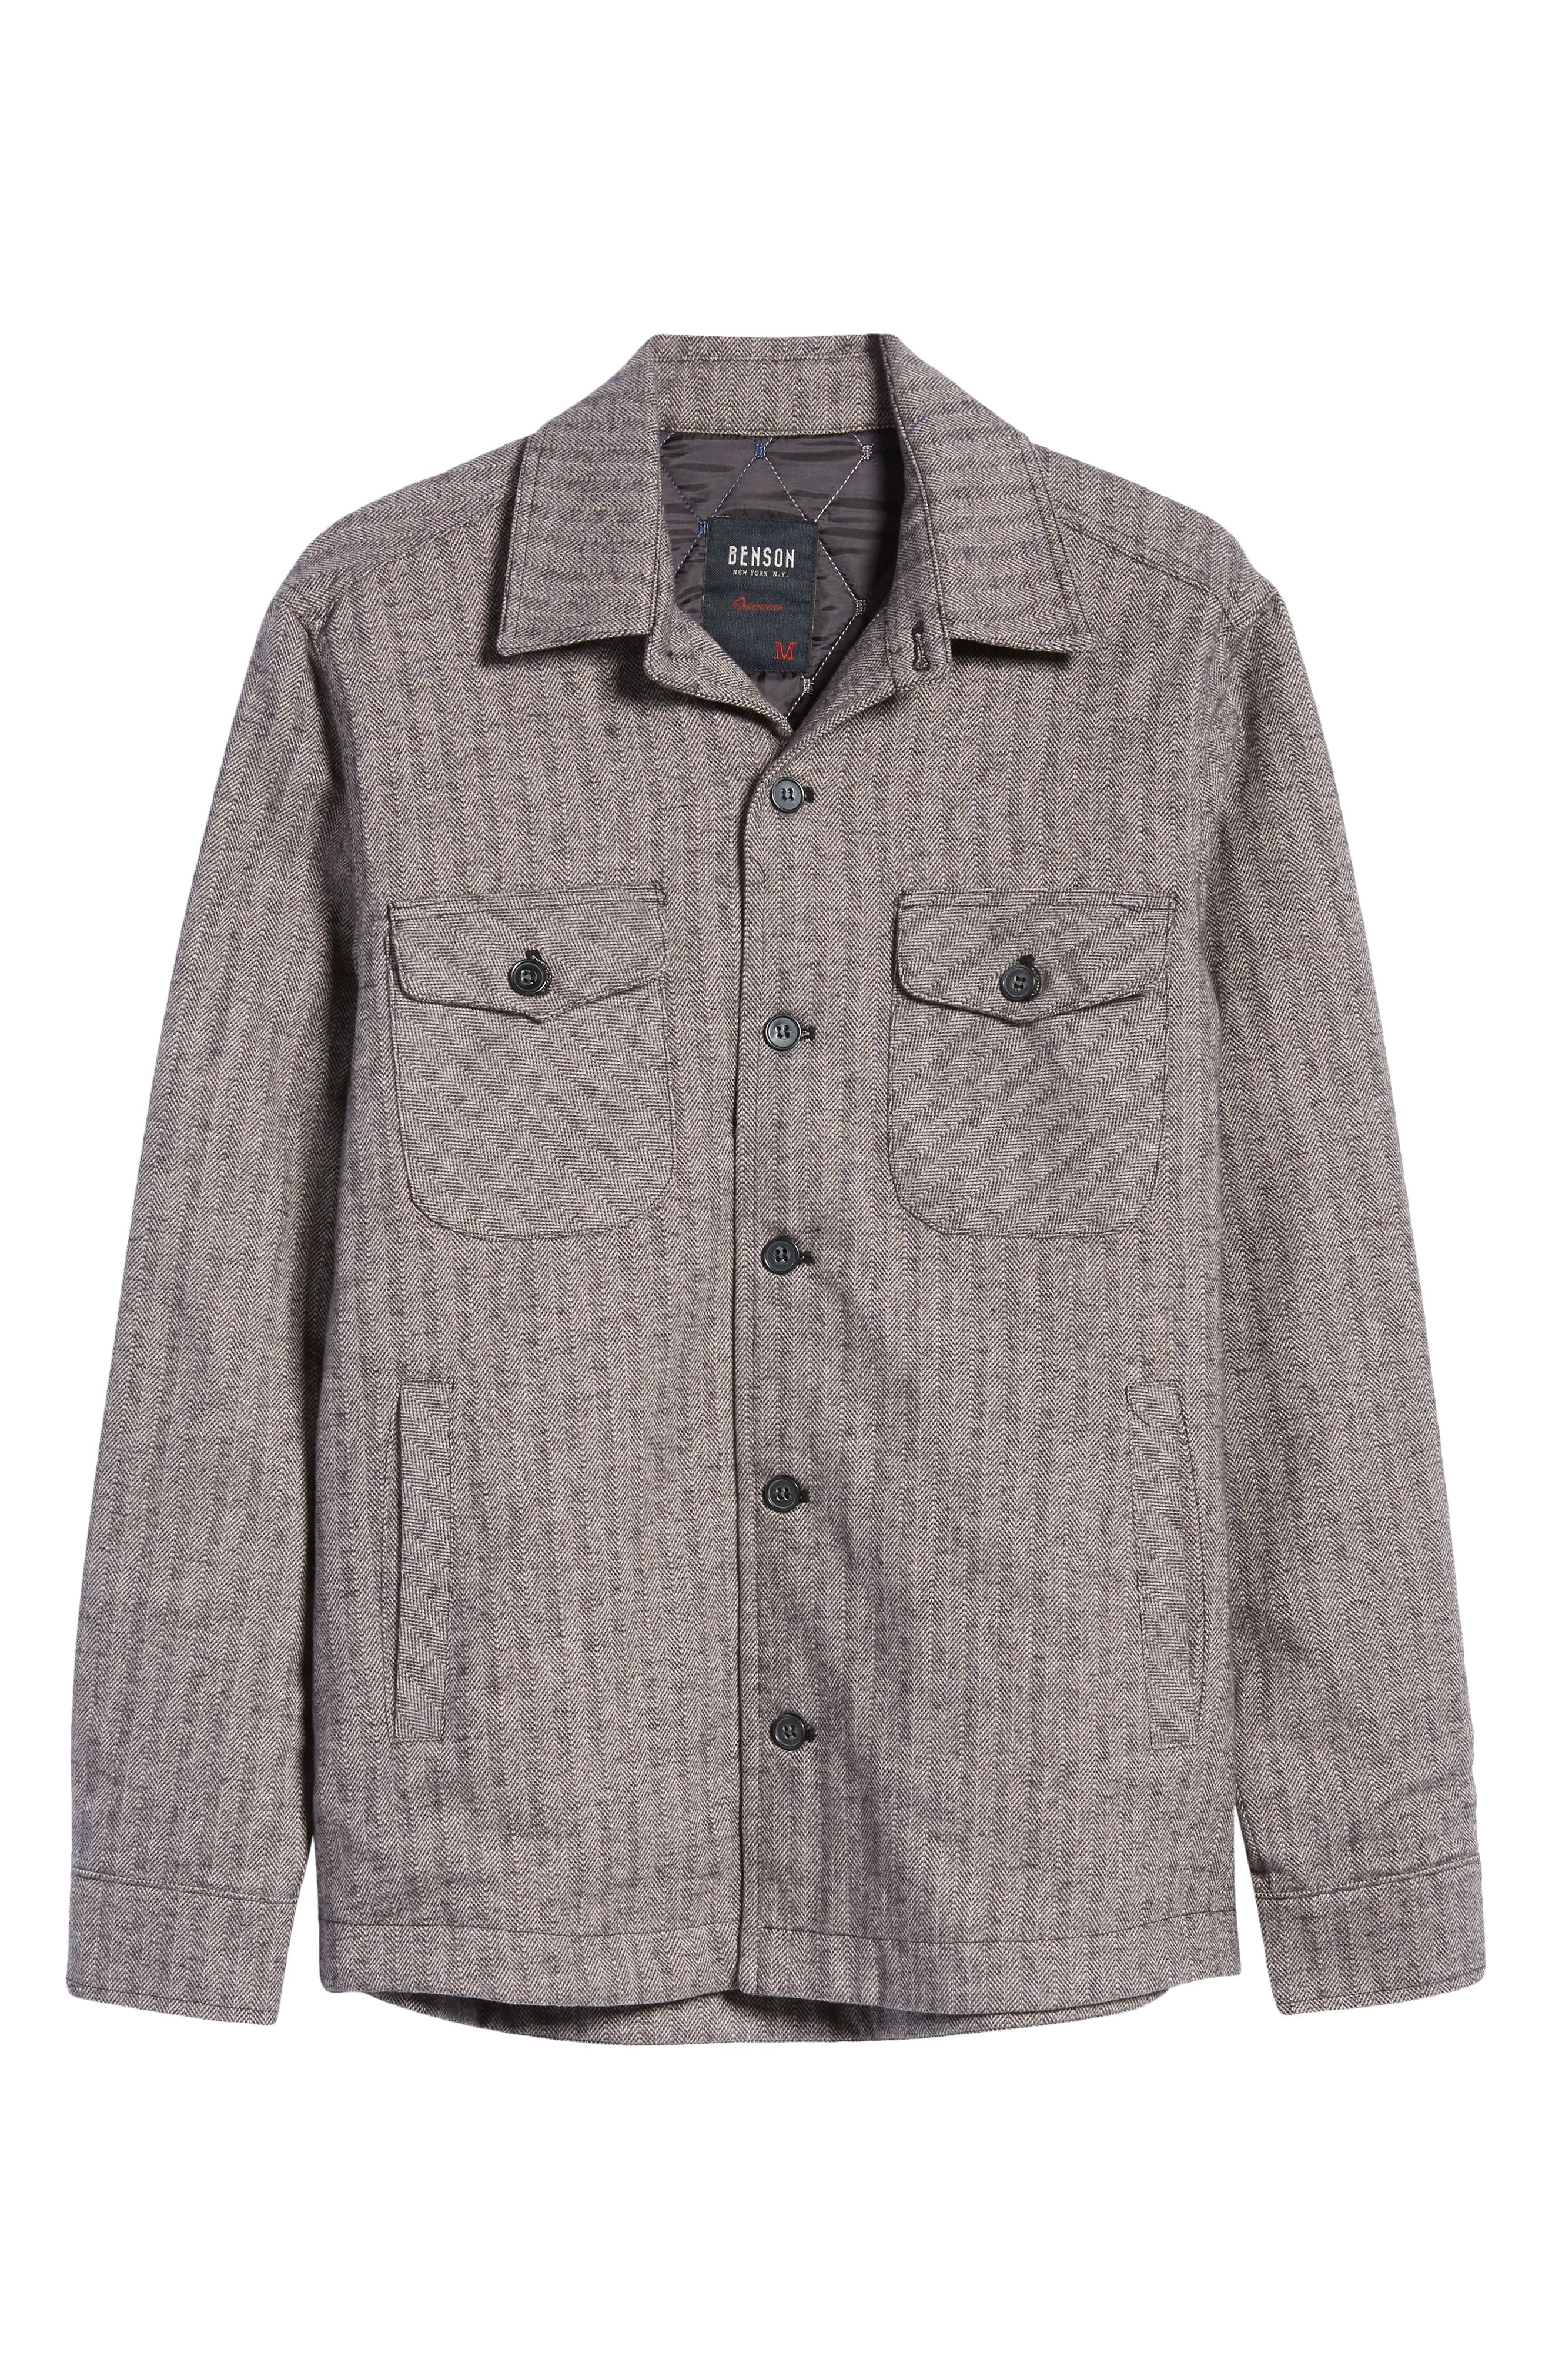 Men's Vintage Workwear – 1920s, 1930s, 1940s, 1950s Mens Benson Cotton Shirt Jacket Size XX-Large - Grey $225.00 AT vintagedancer.com